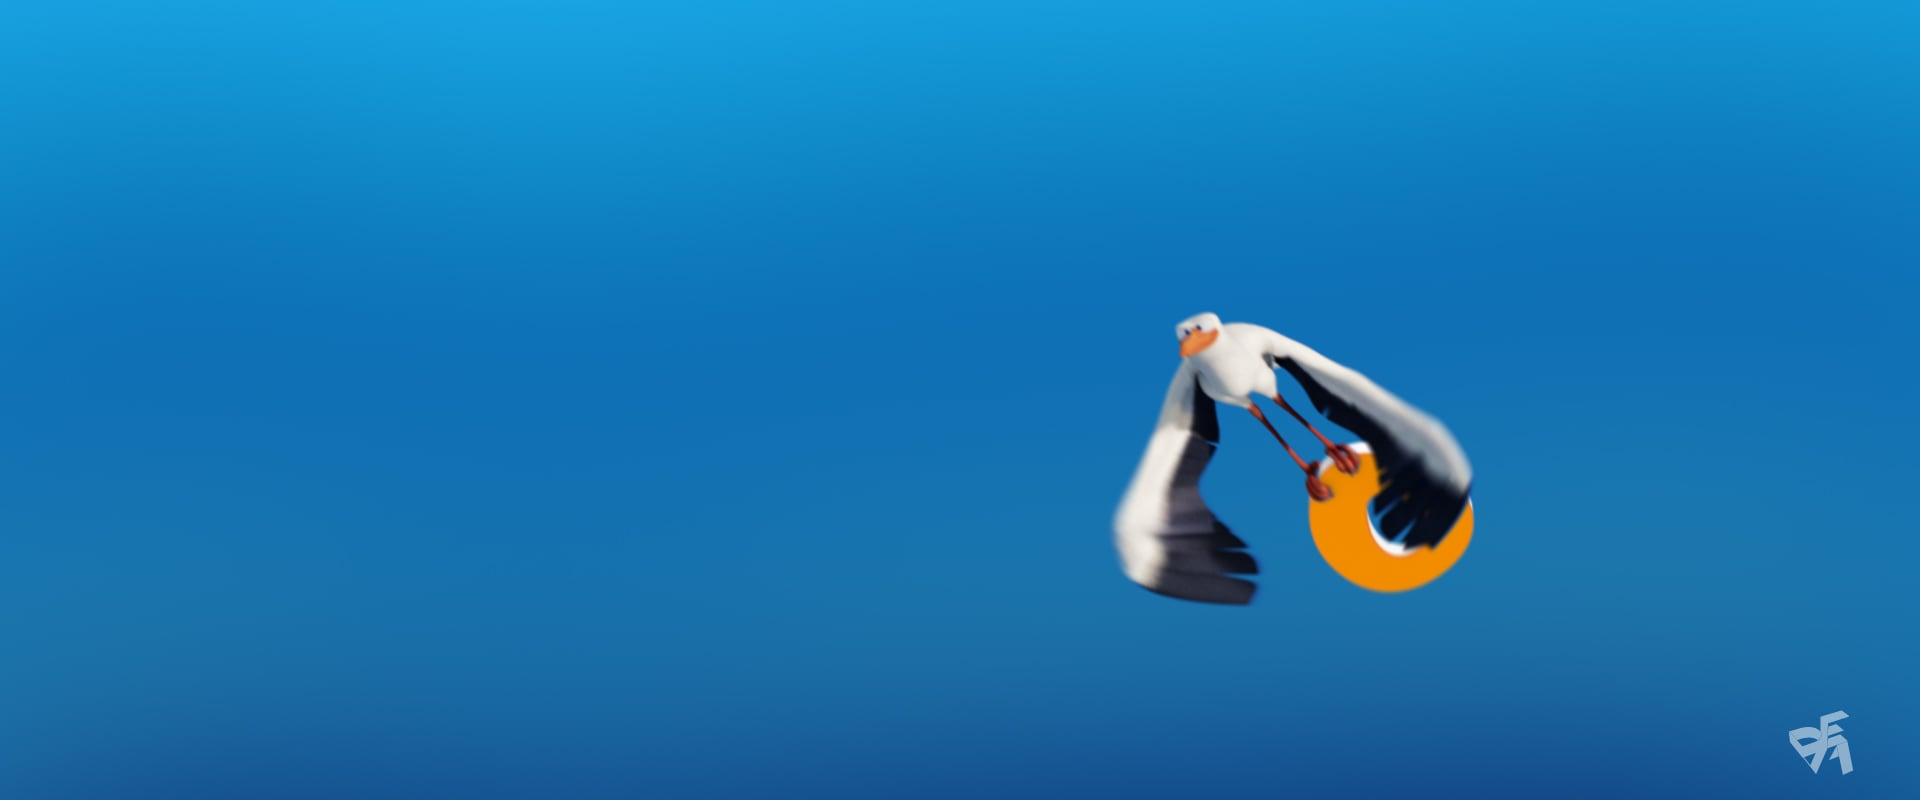 Storks-TRAILERSTILL-devaGFX_02.jpg